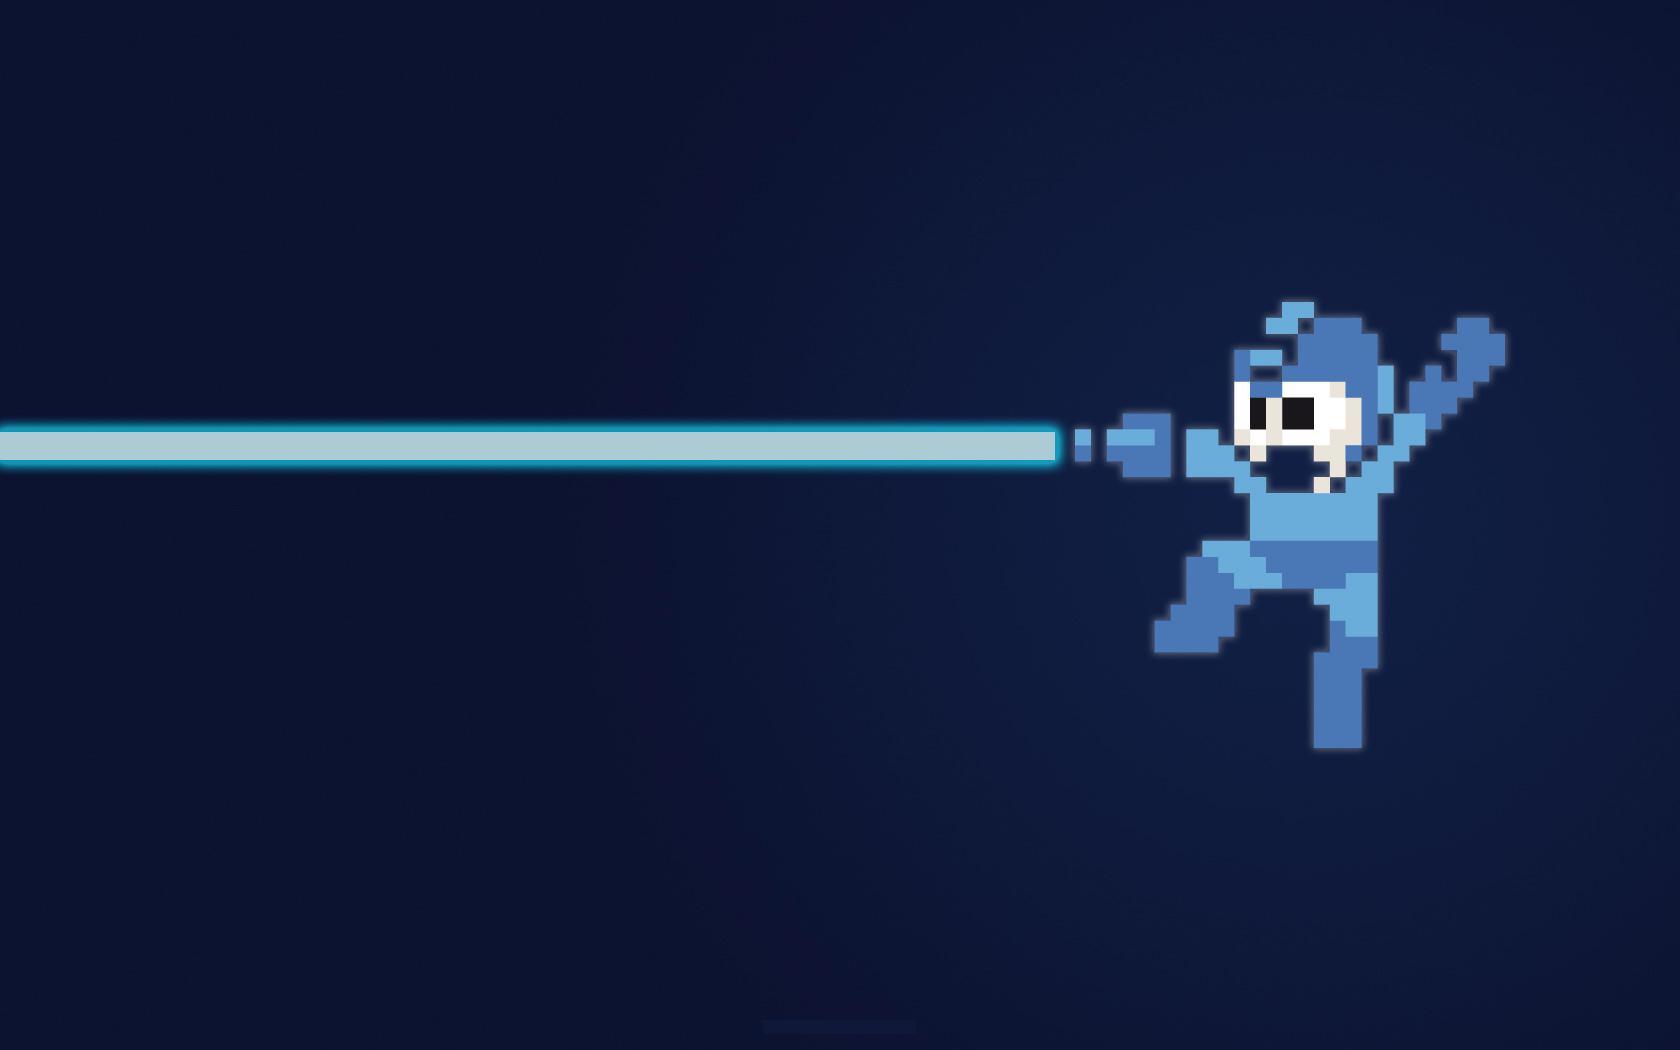 Dynamic Wallpaper Iphone X Mega Man Backgrounds Wallpaper Cave